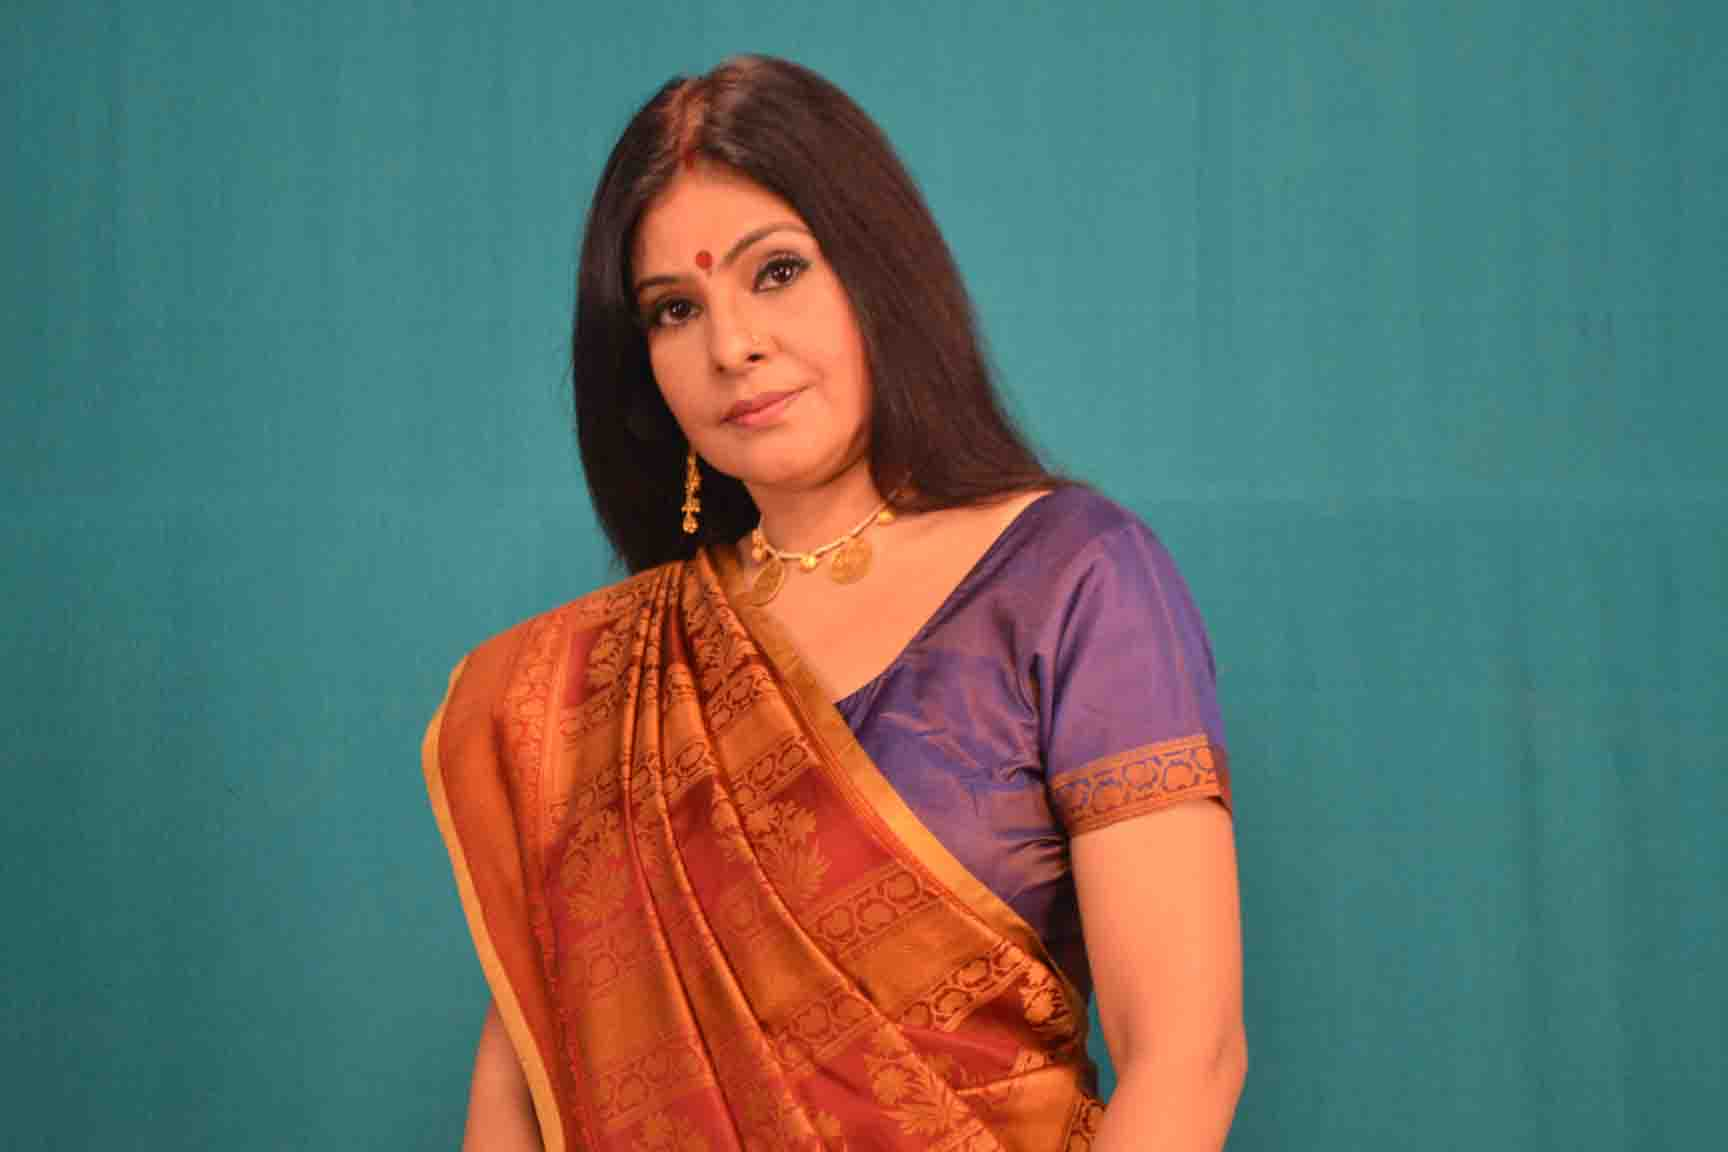 Malini Awasthi | Atul Malikram PR 24×7 Network Ltd